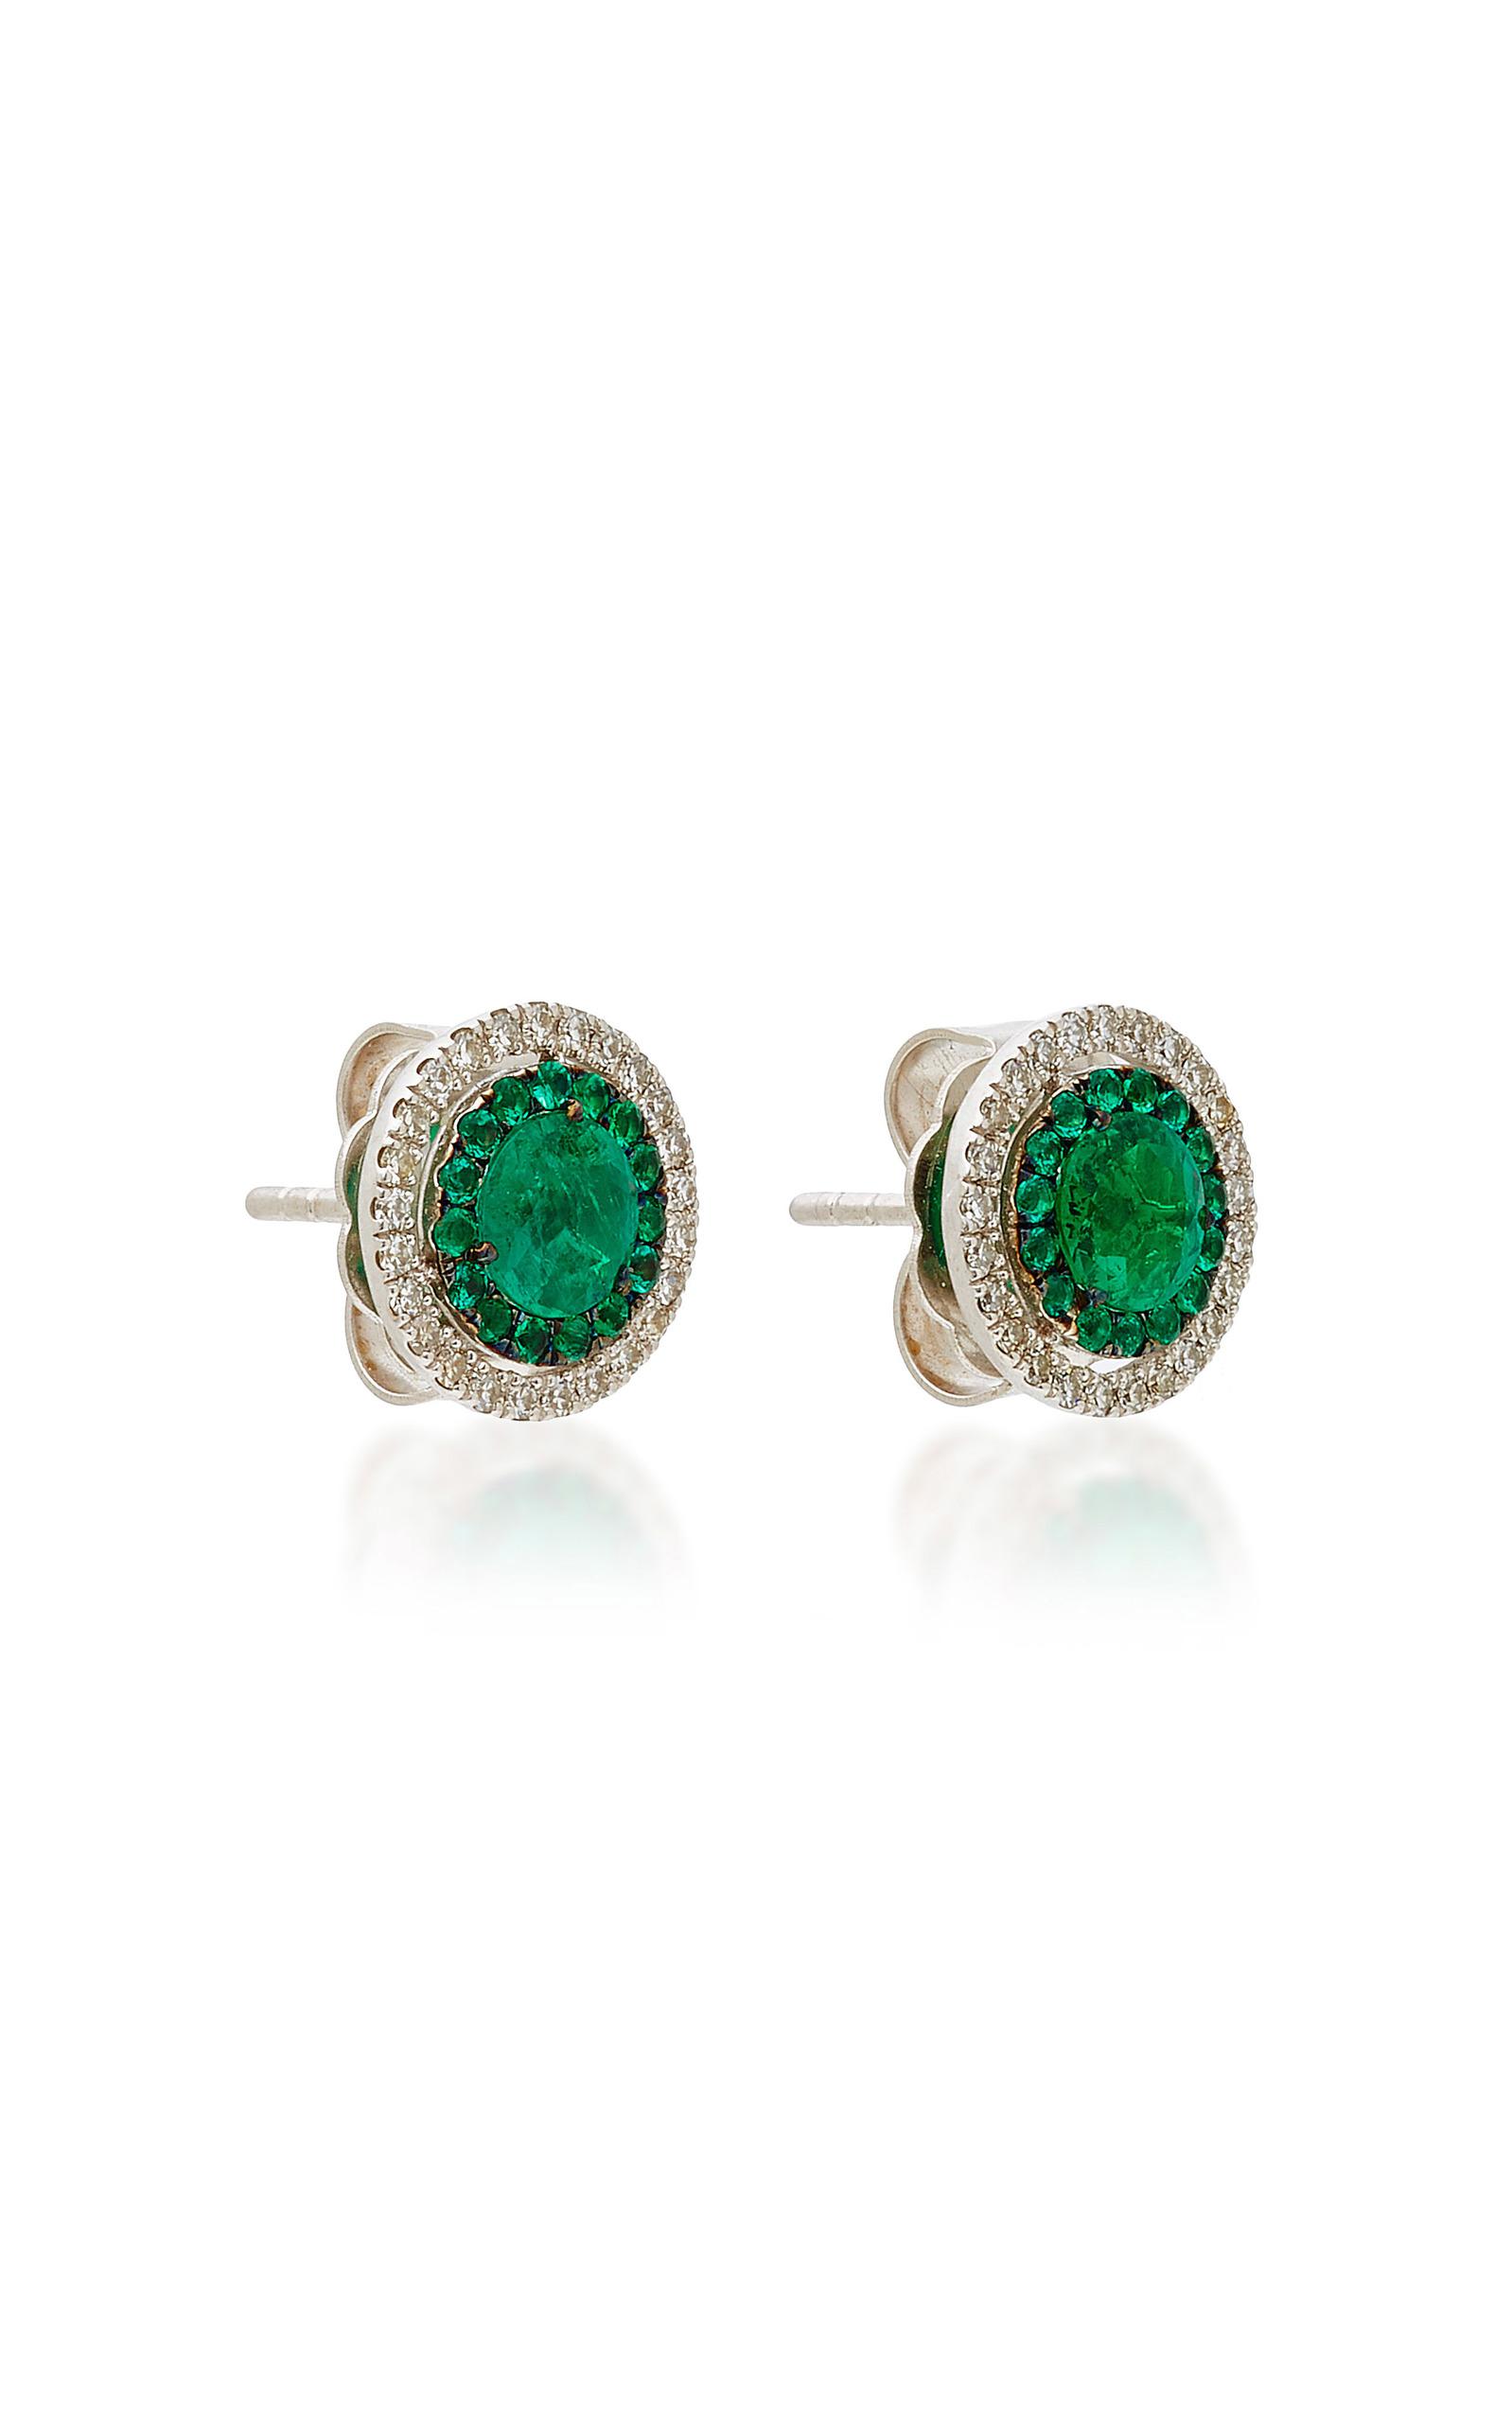 Emerald & Diamond Target Stud Earrings